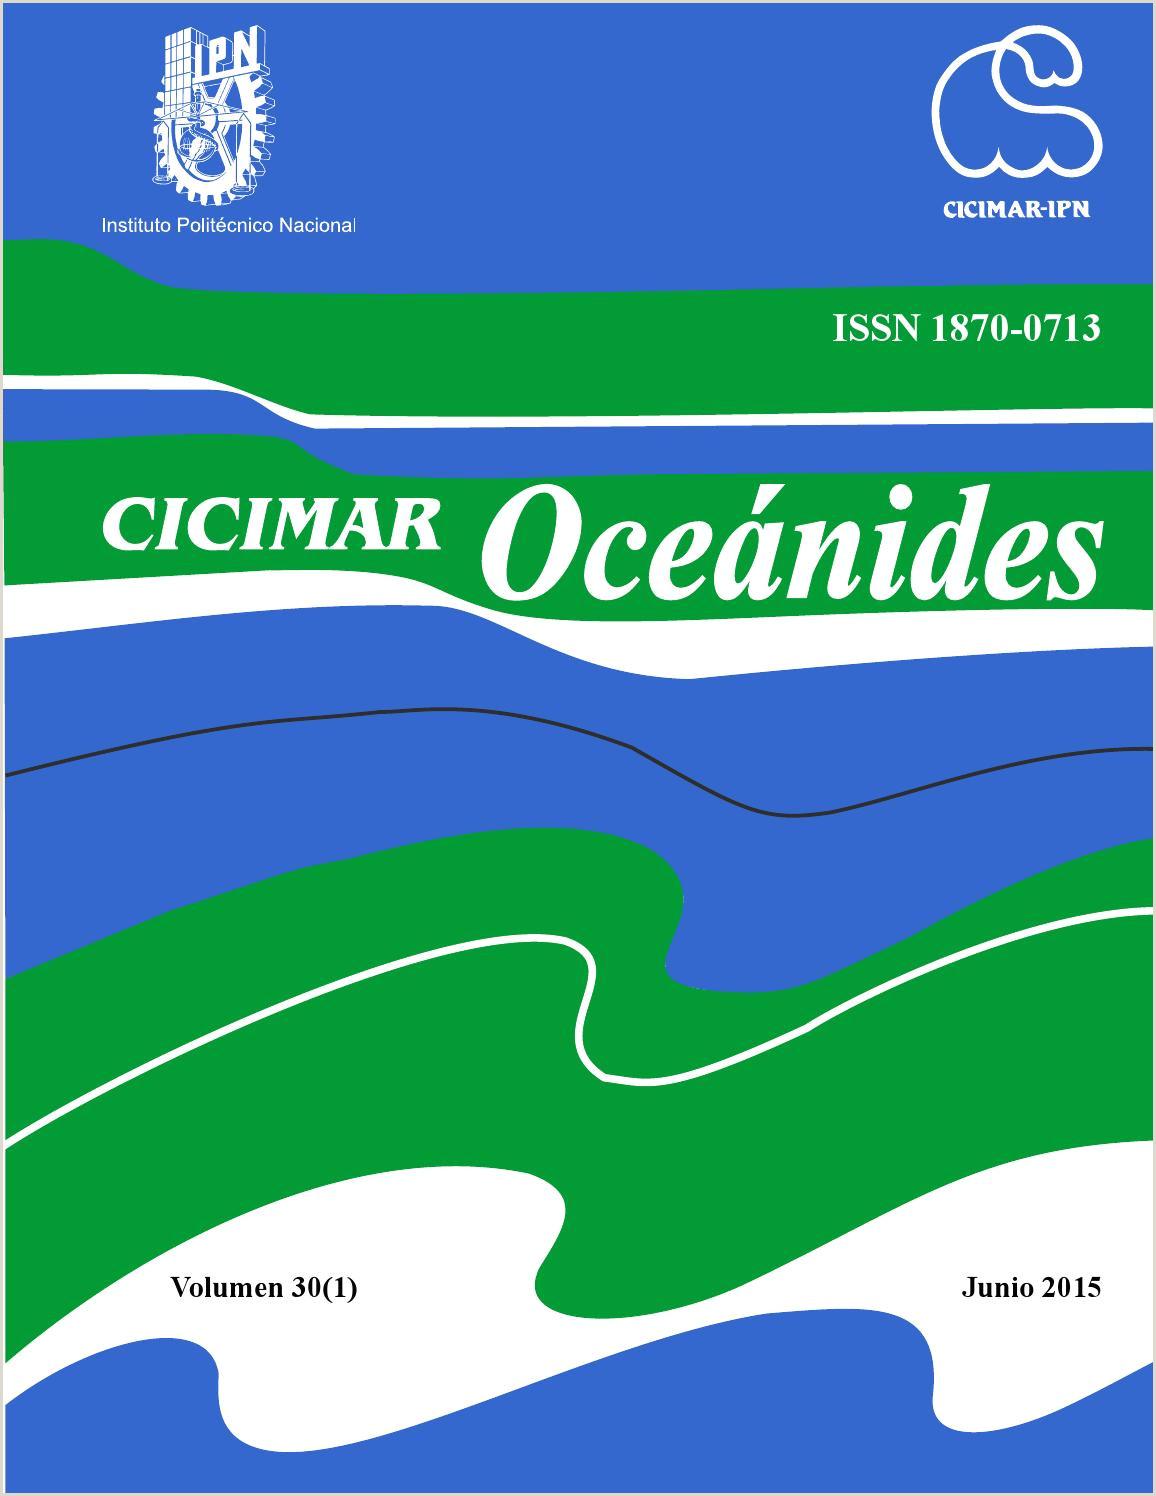 CICIMAR Oceánides Vol 30 1 2015 by CICIMAR Oceánides issuu